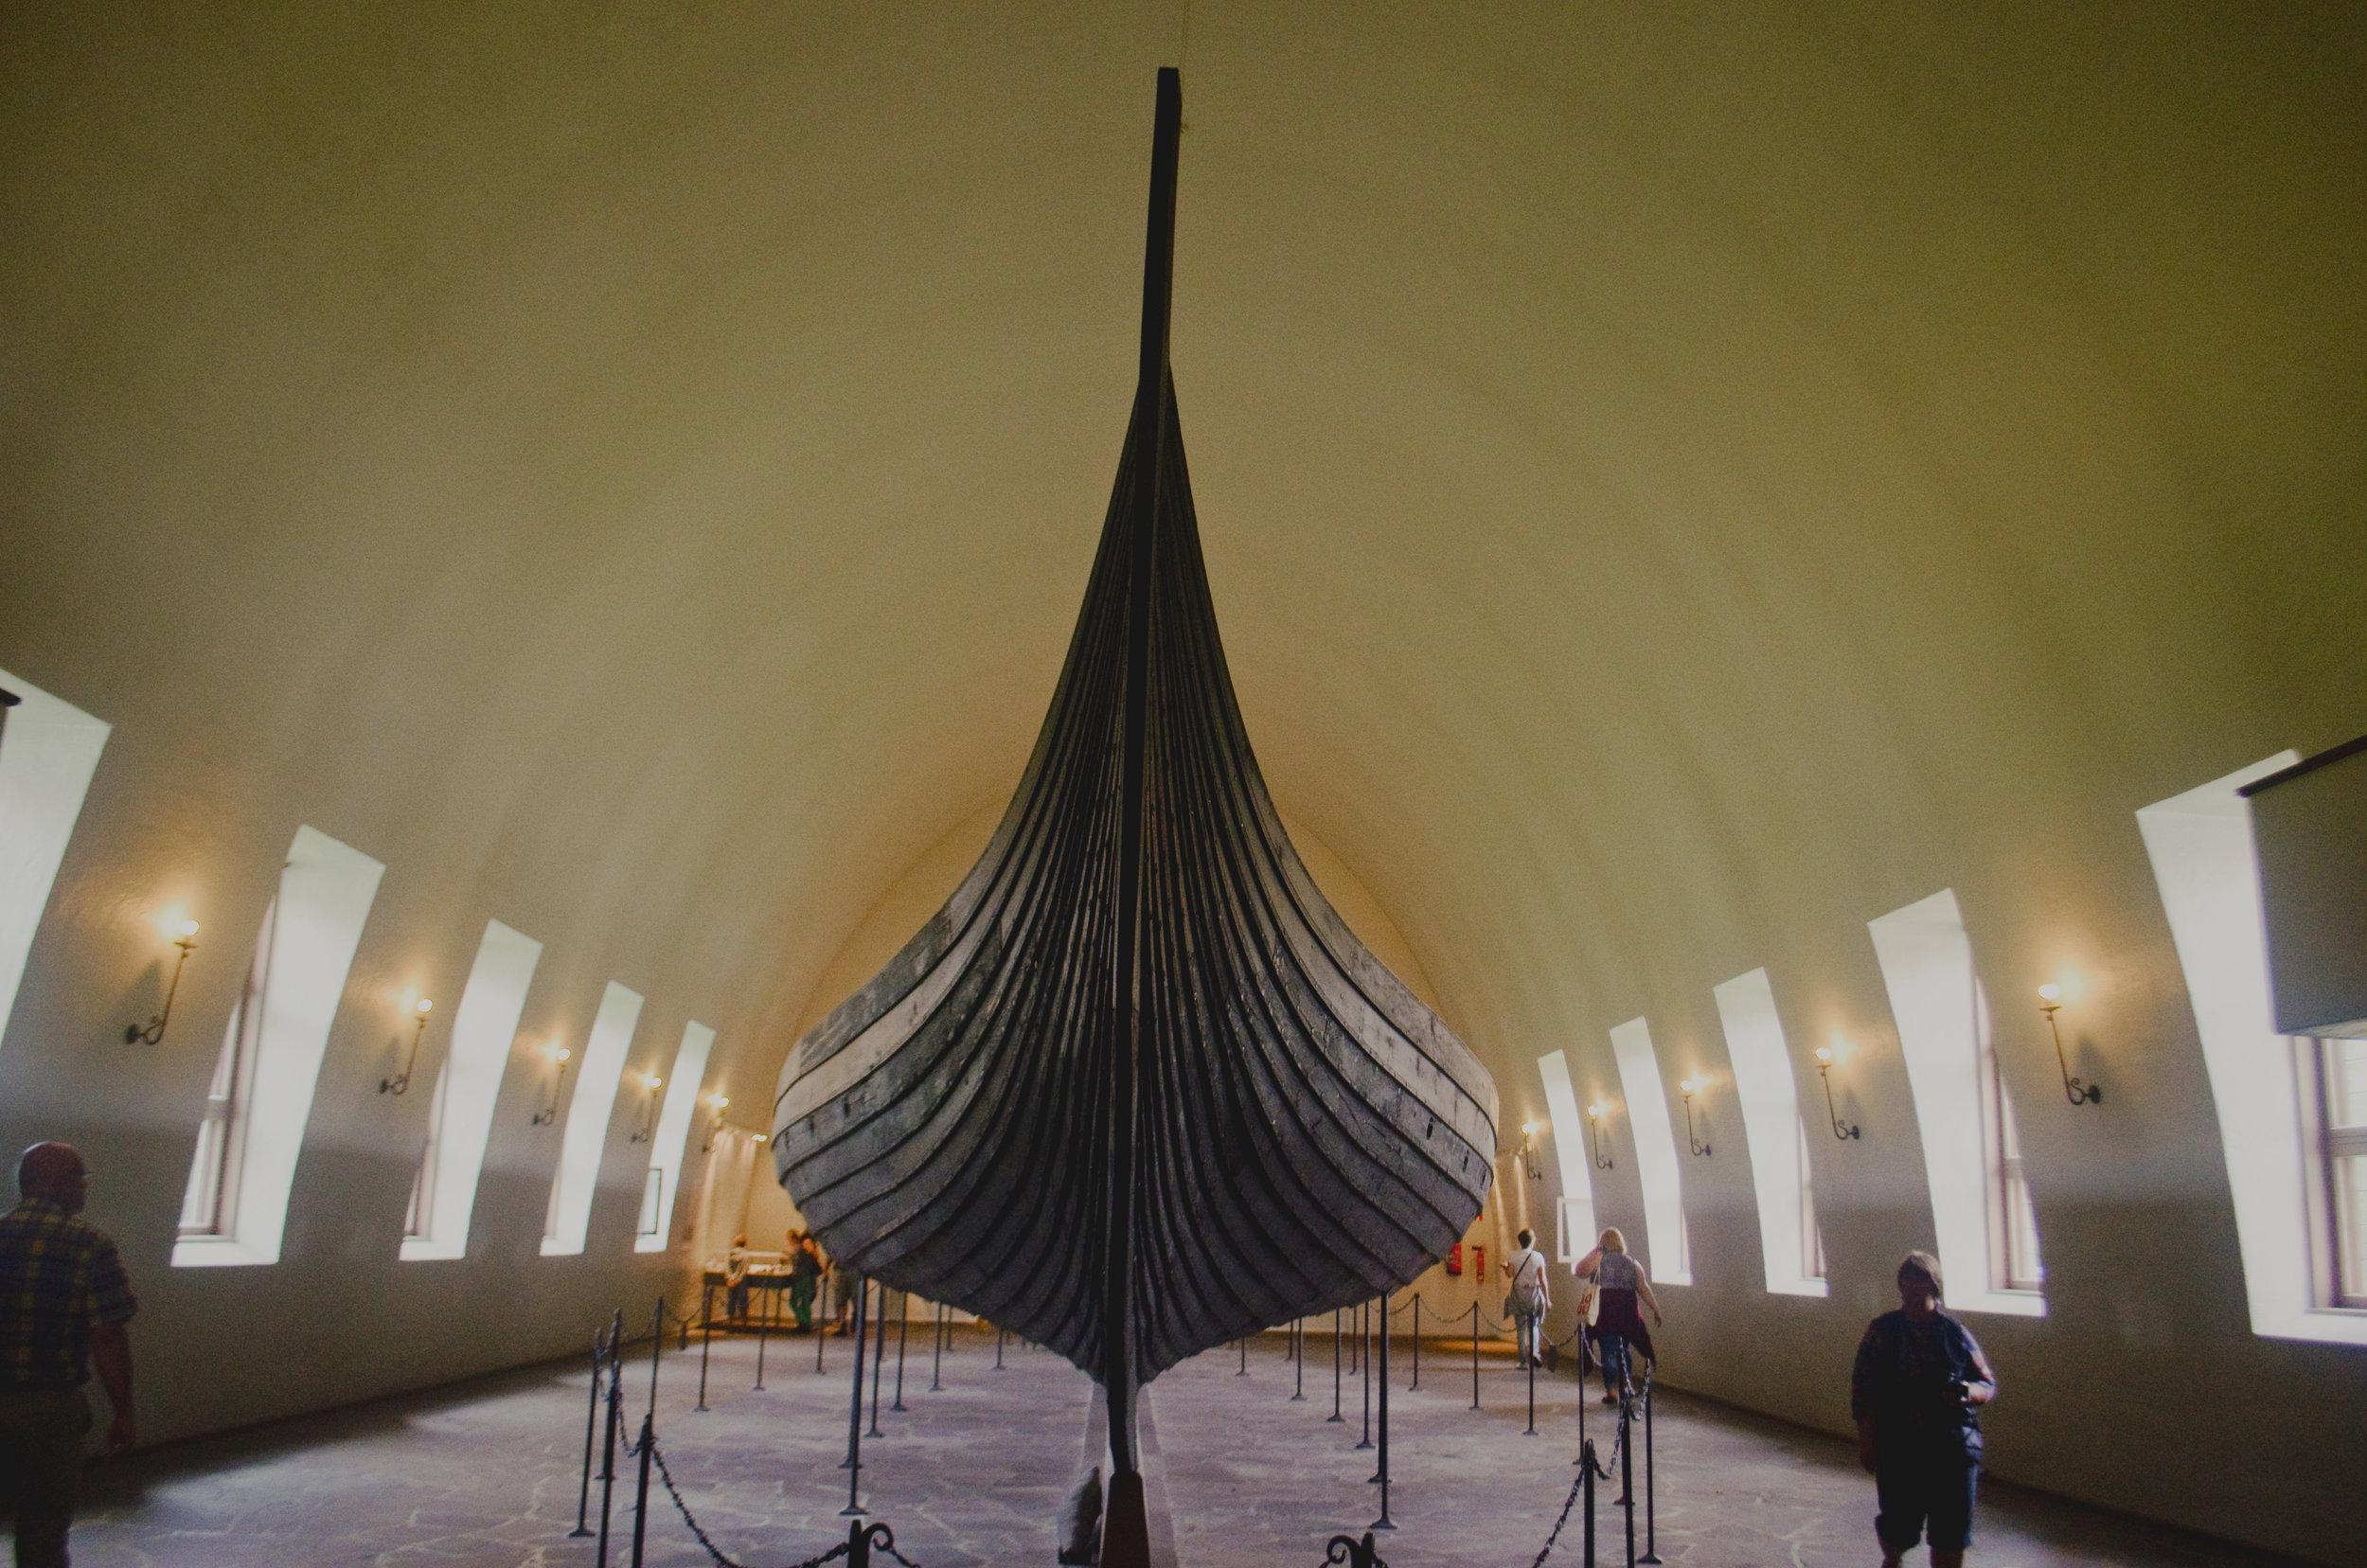 The most popular angle of the Gokstad ship